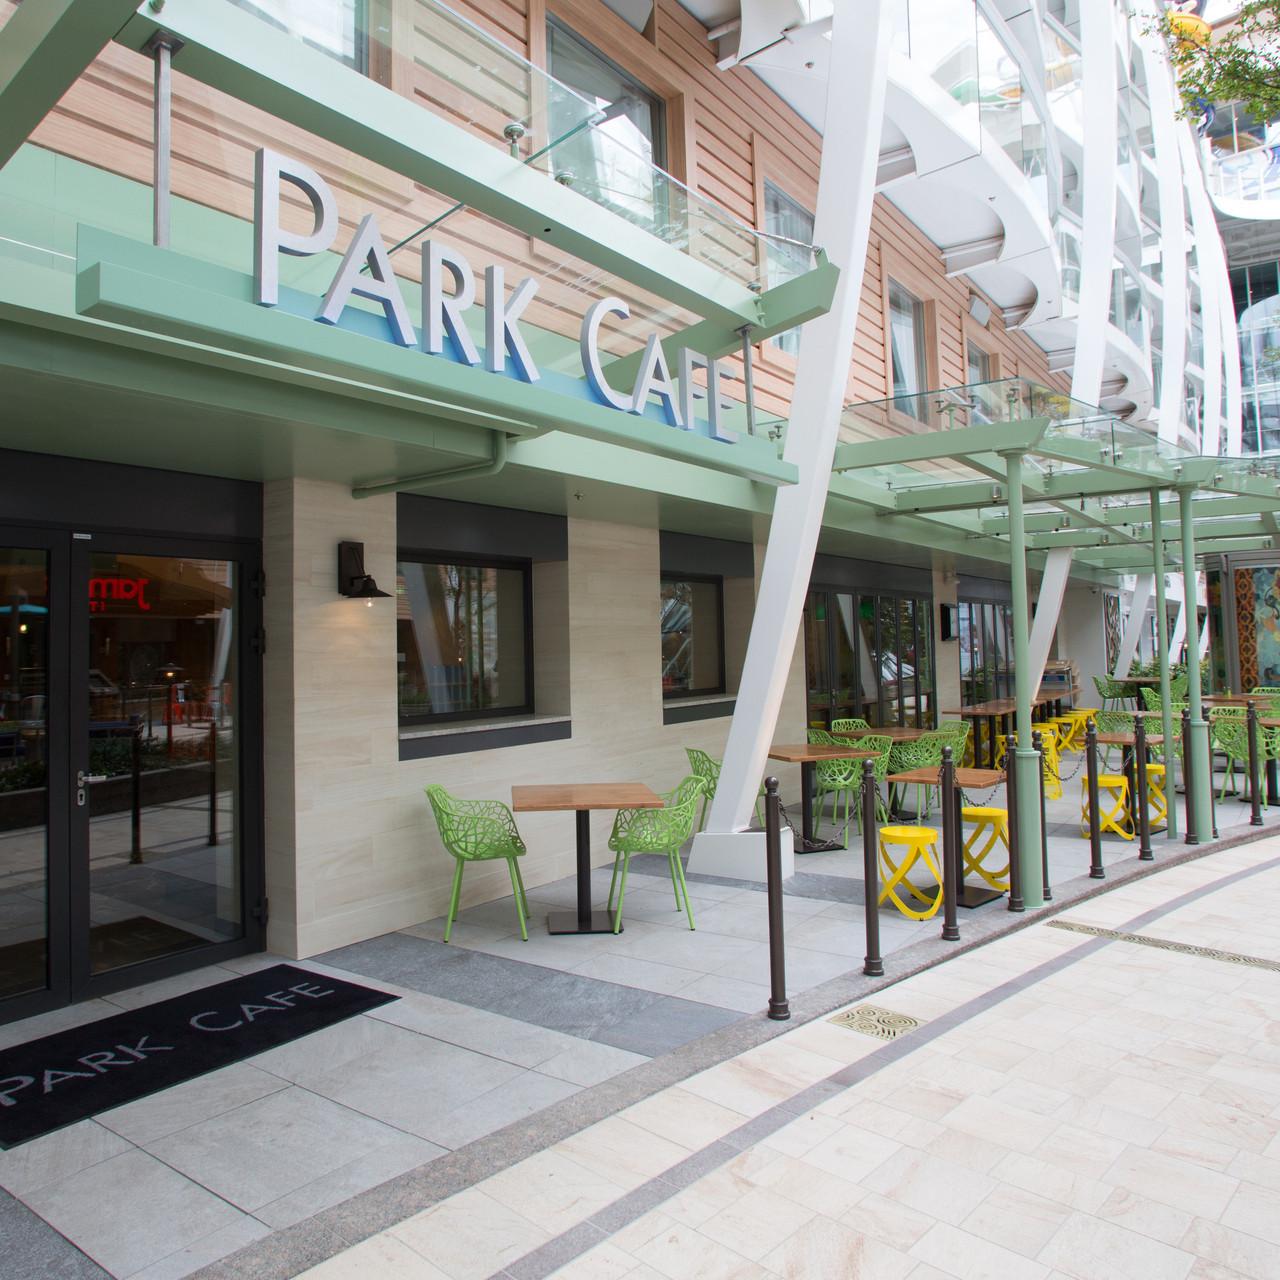 Park Cafe ext